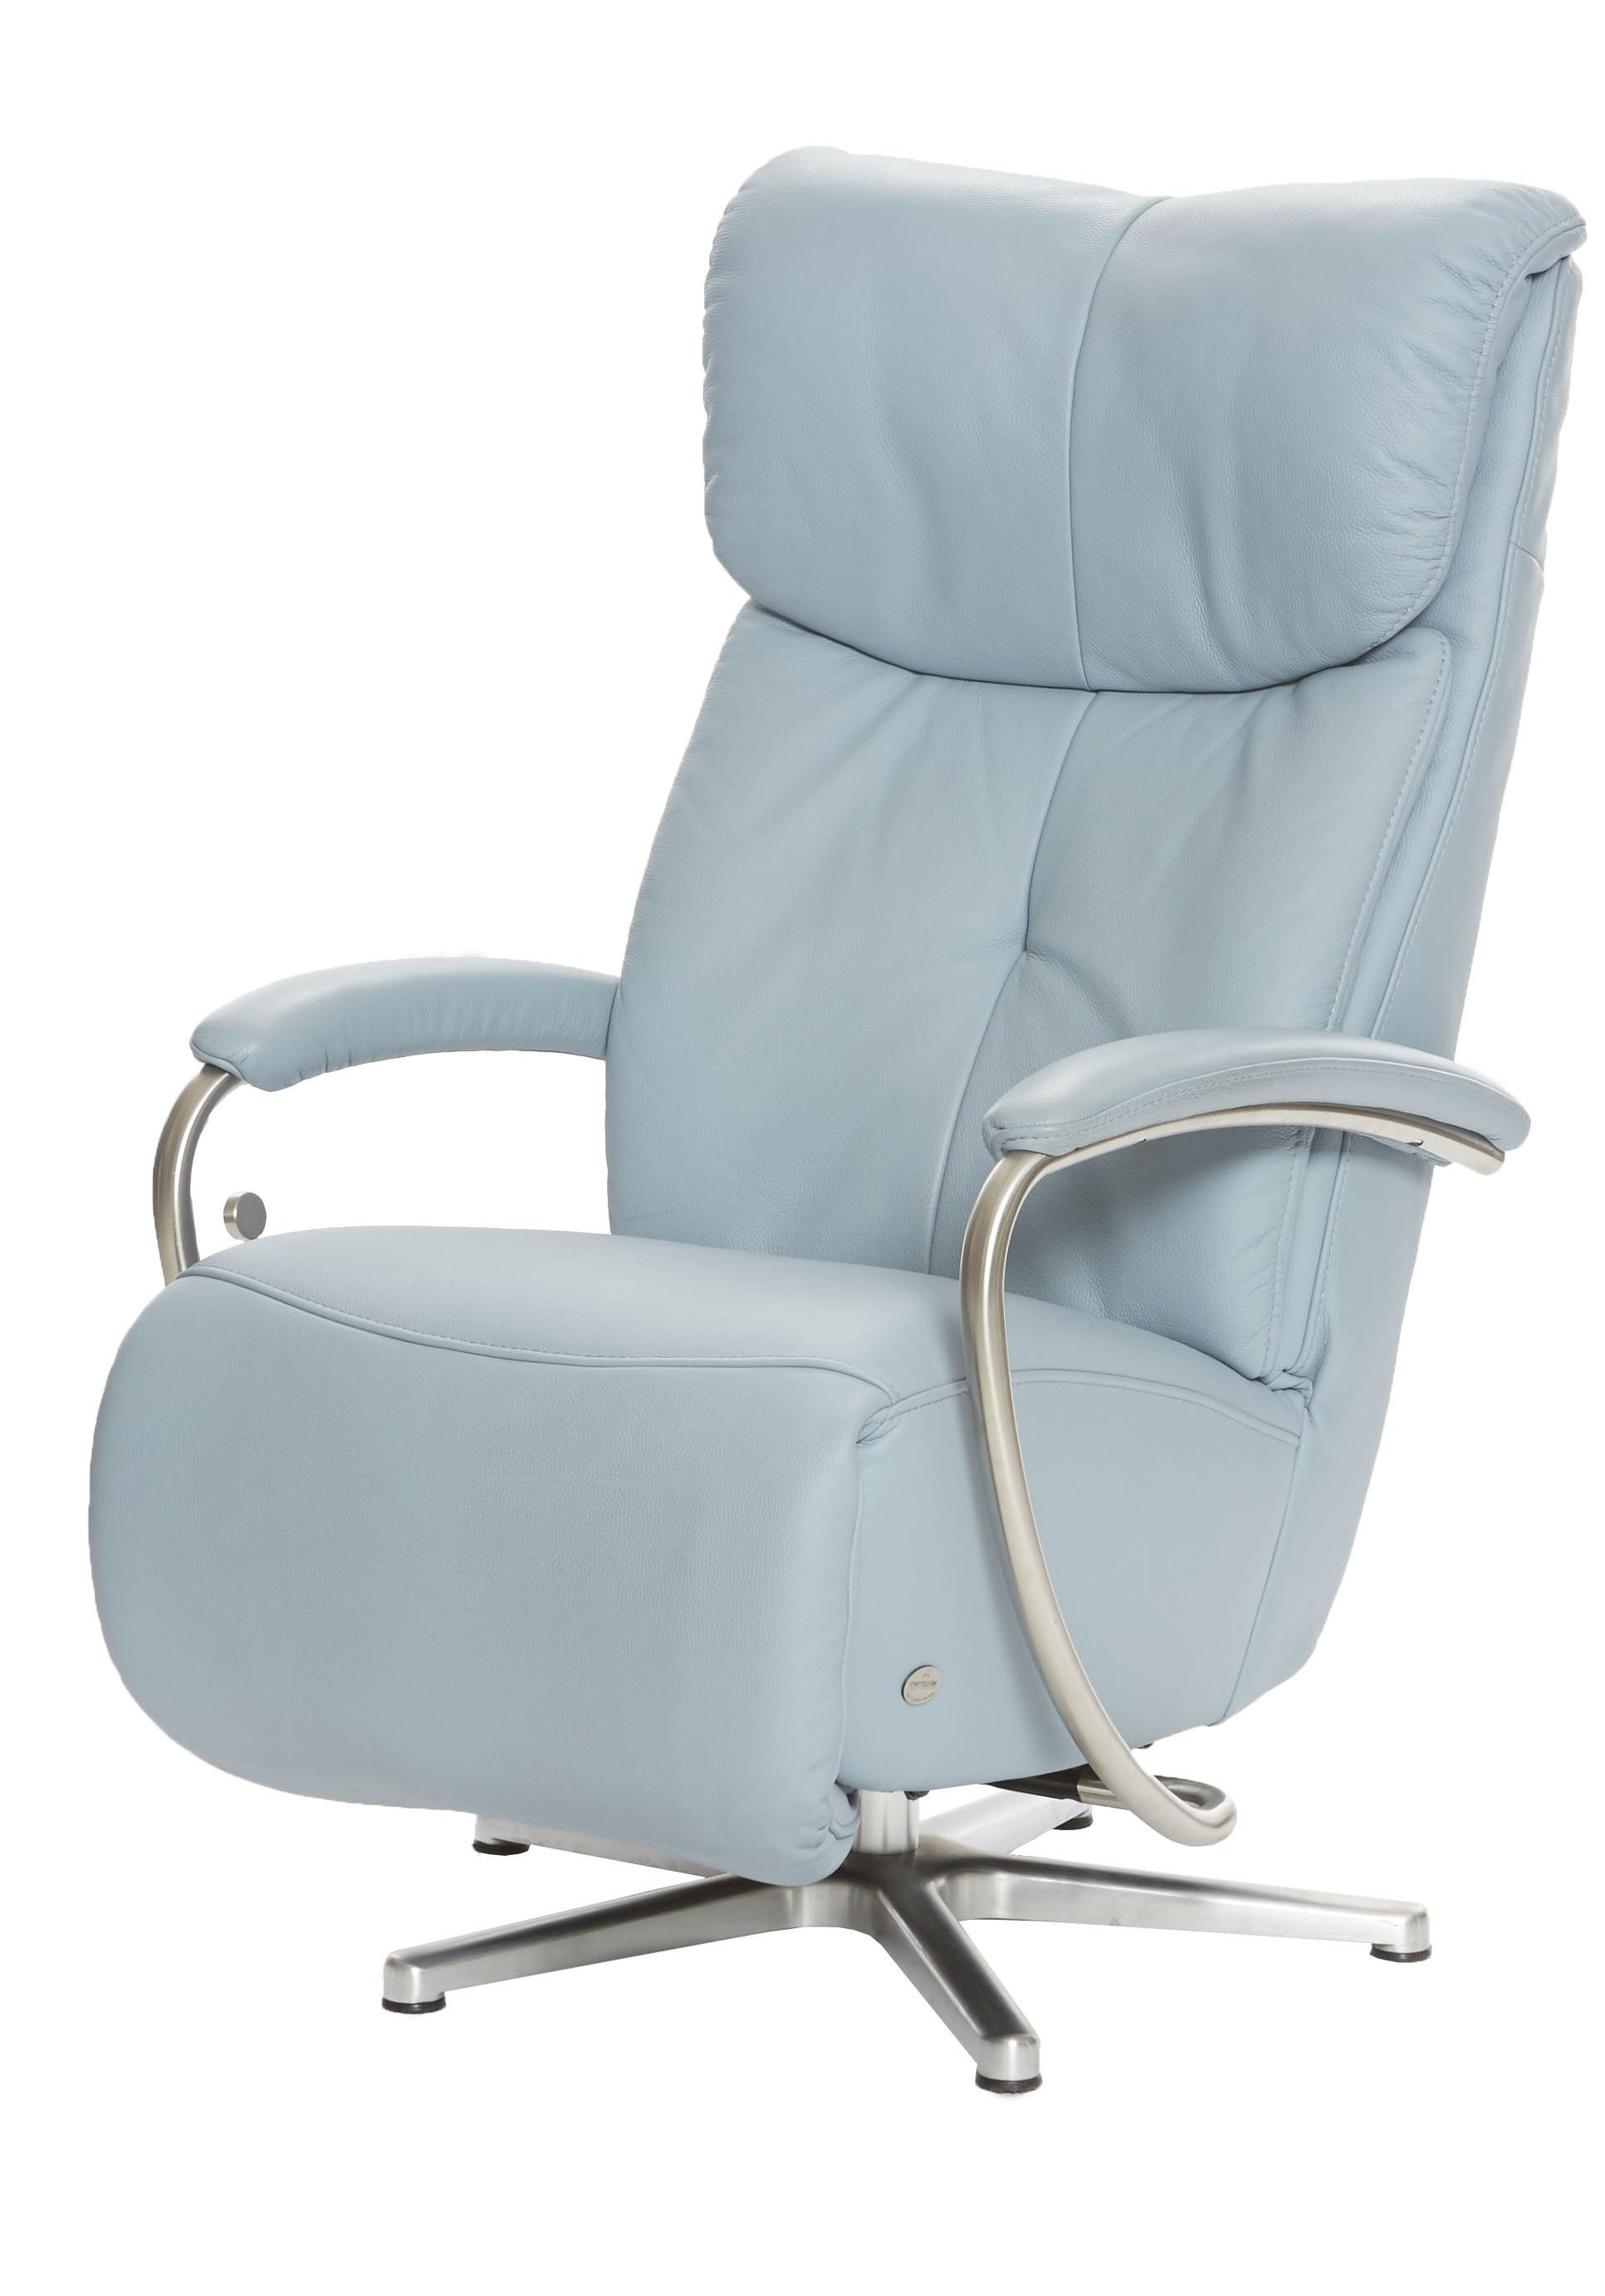 Relaxstoel easysit s54 easysit for Relax stoel